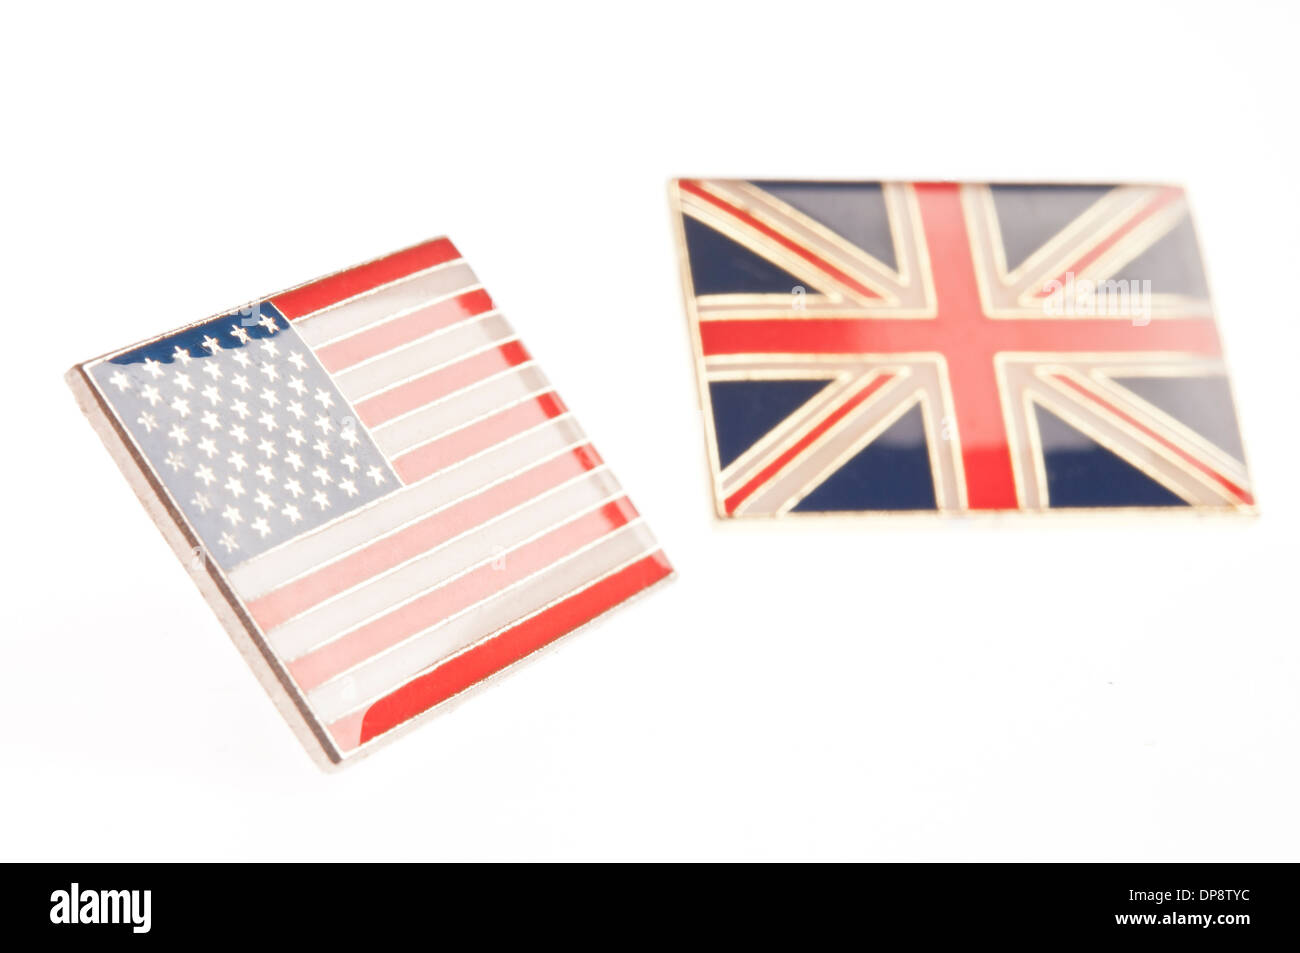 USA and UK lapel pins - Stock Image